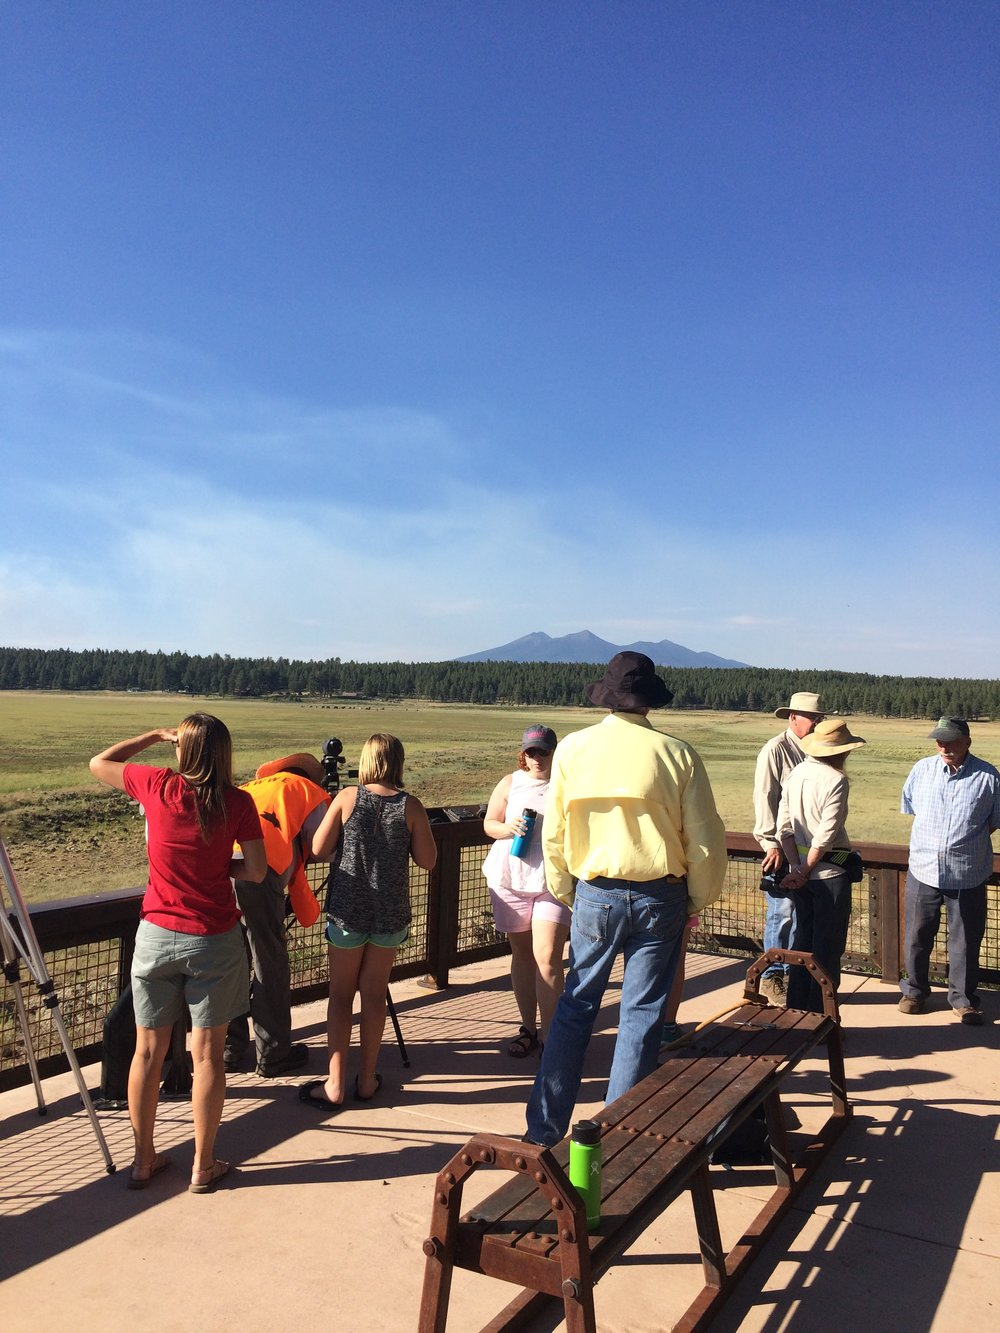 Visitors enjoy the watchable wildlife platform at Rogers Lake County Natural Area.